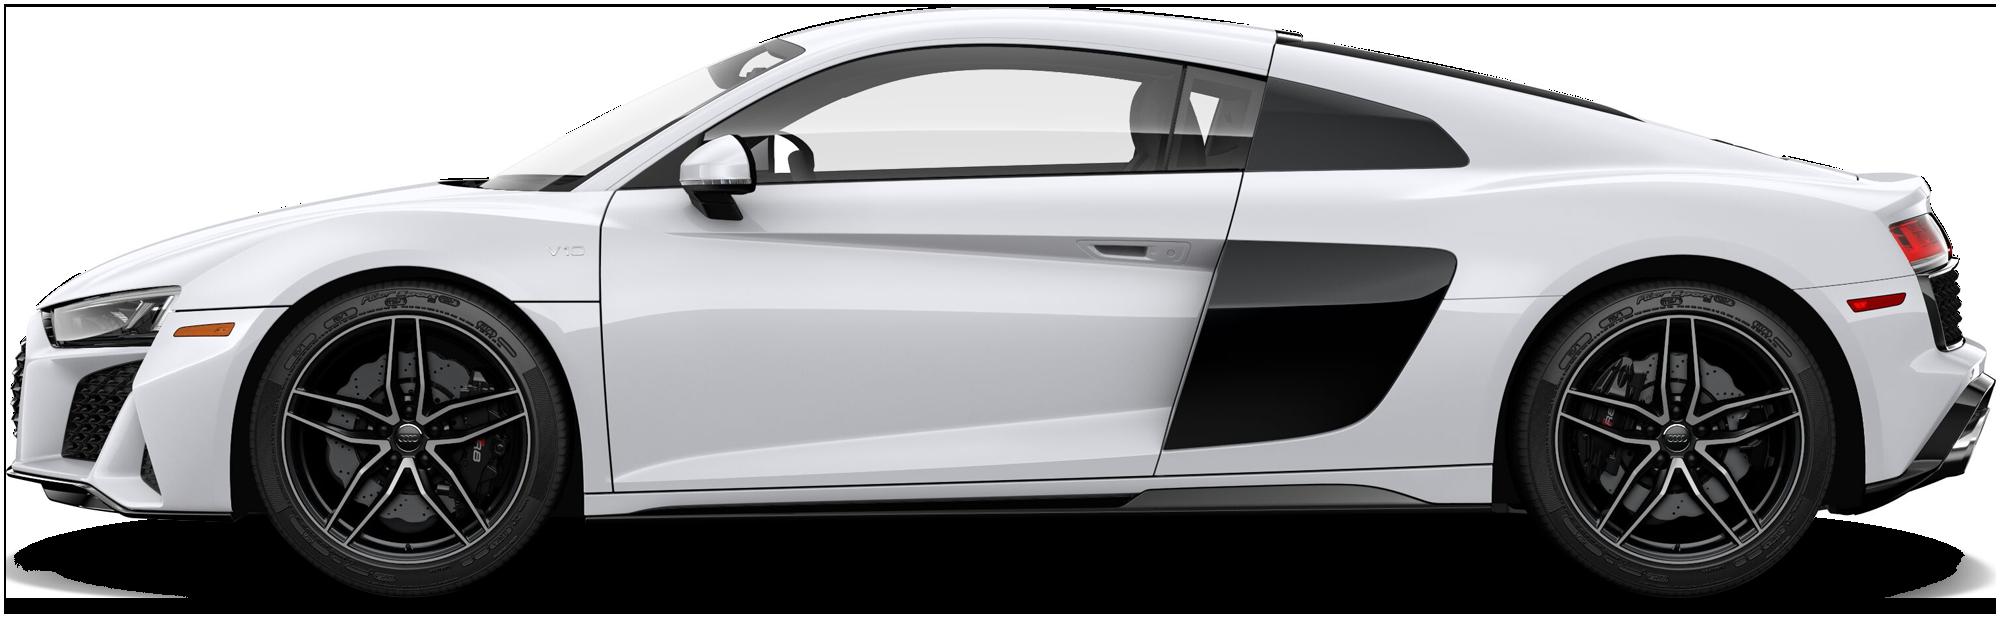 2020 Audi R8 Coupe 5.2 V10